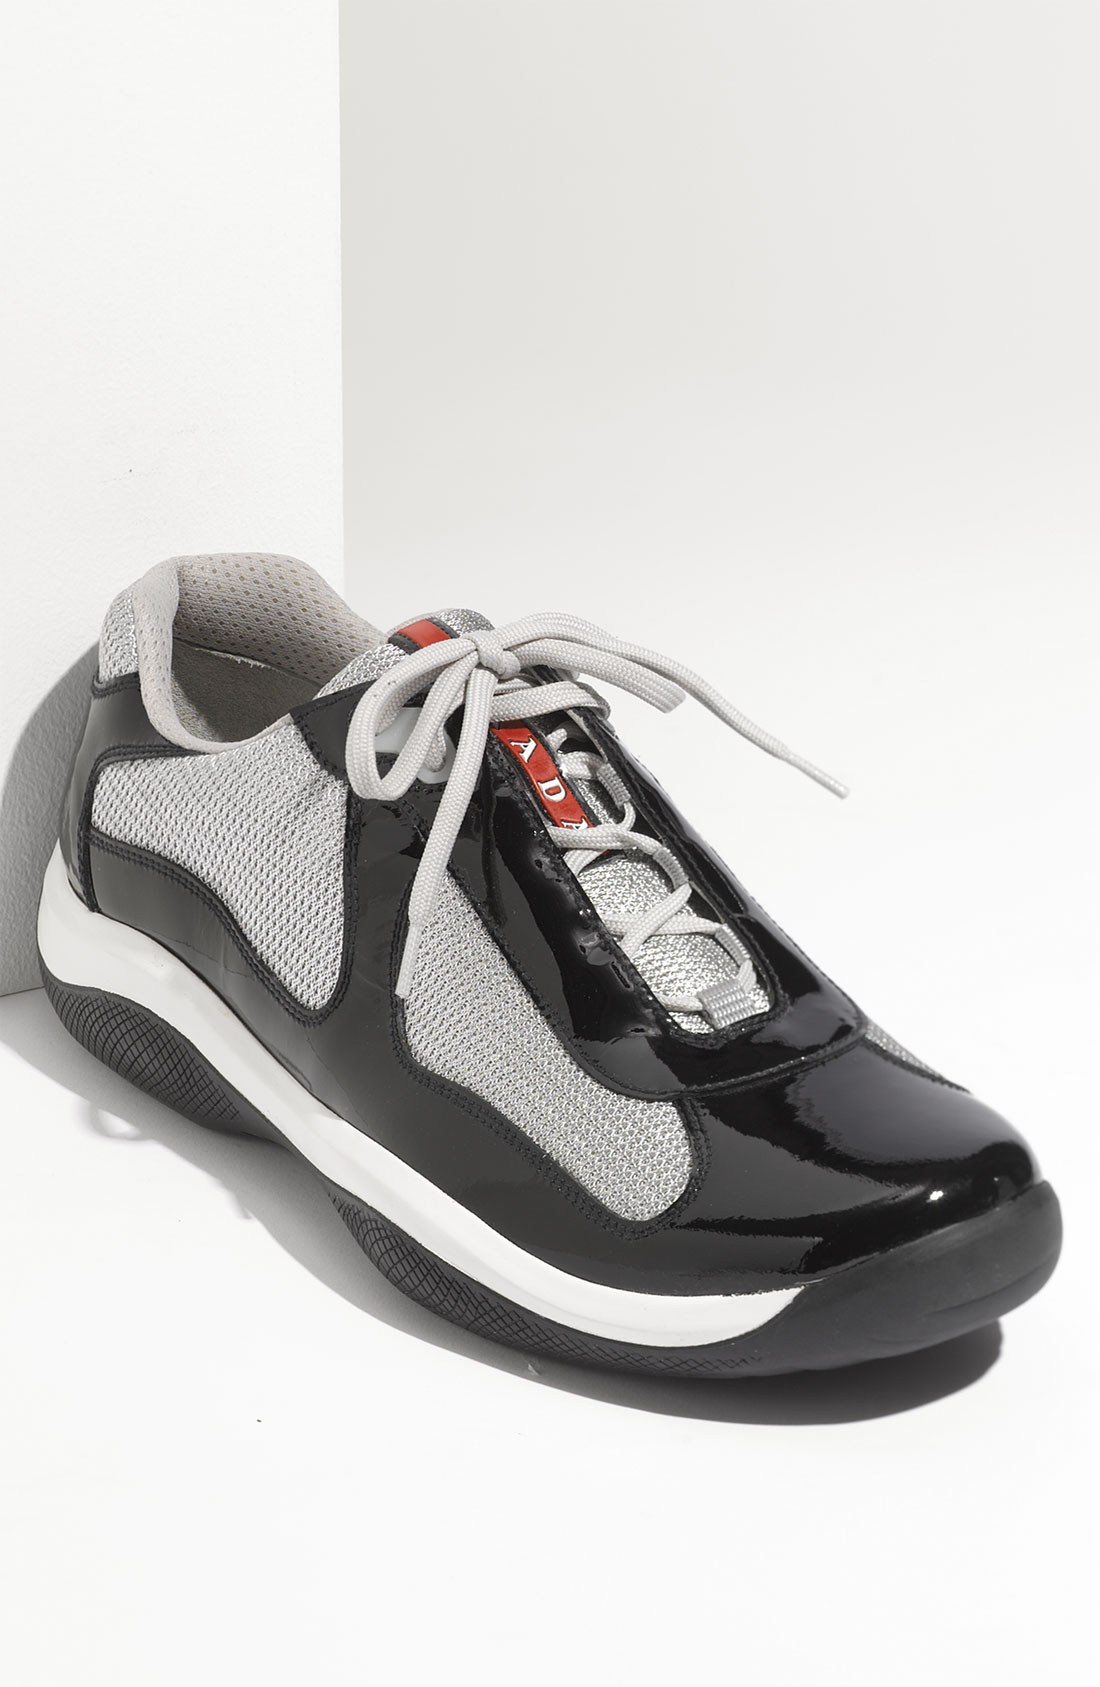 Prada Mens Black Patent Leather Shoes